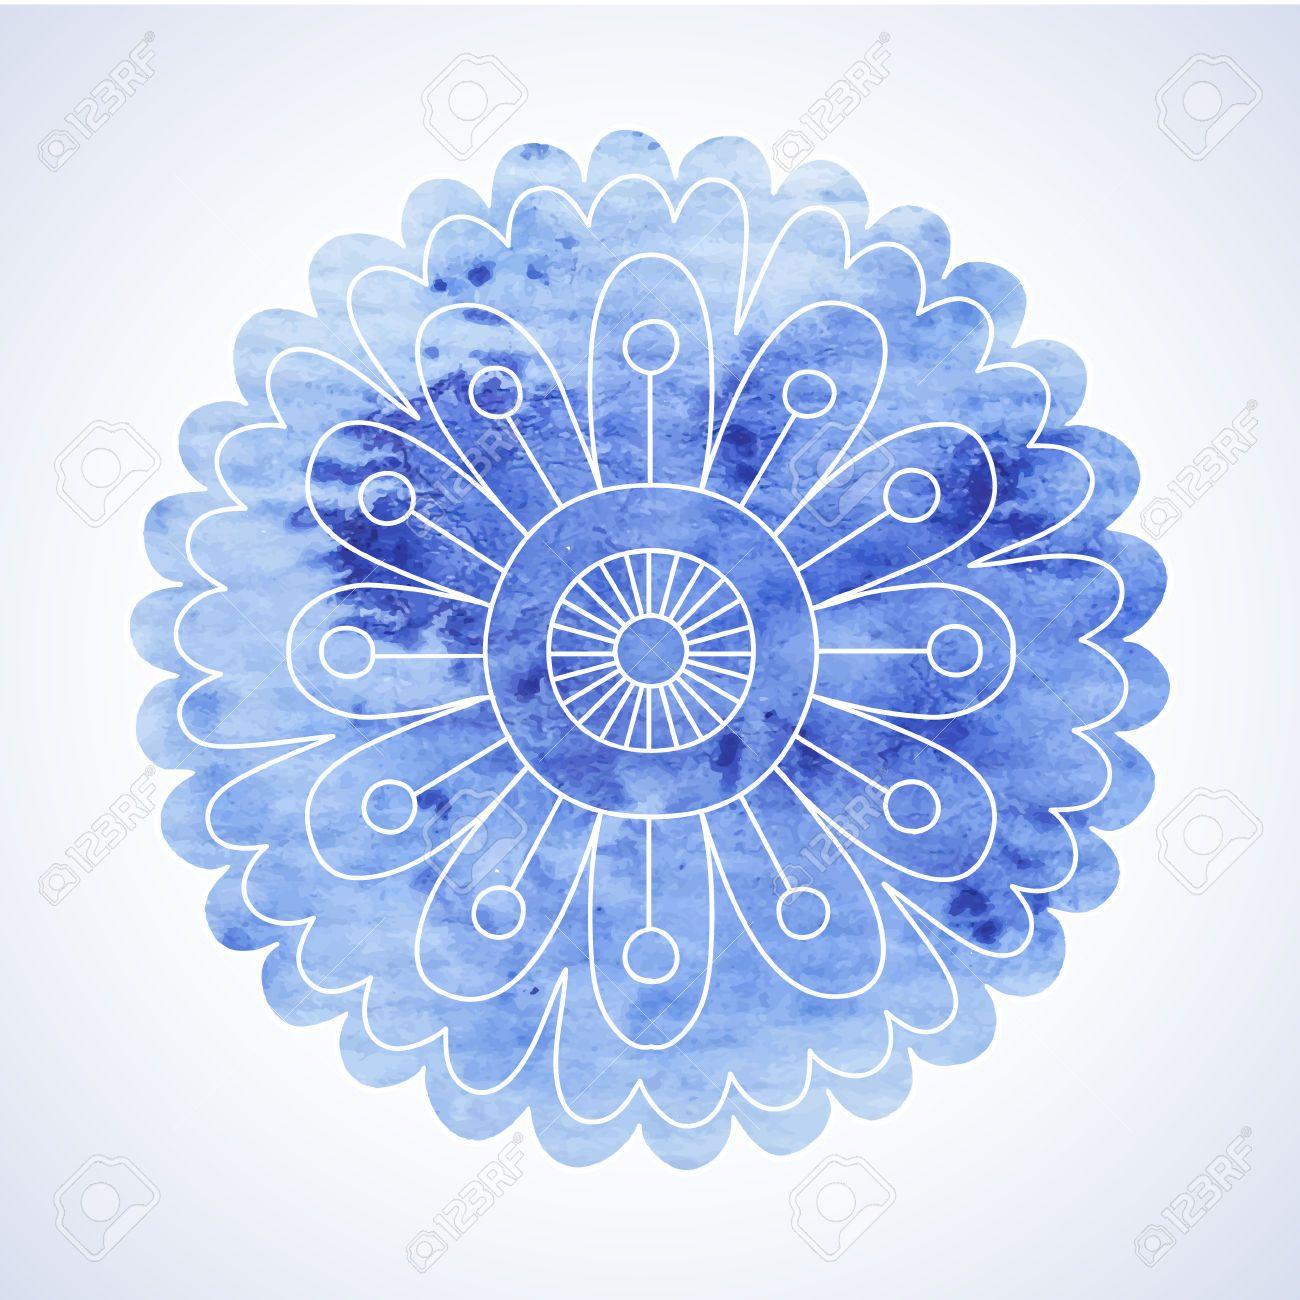 Bildergebnis Fur Mandala Blumen Bunt Floral Art Inspiration Floral Rings